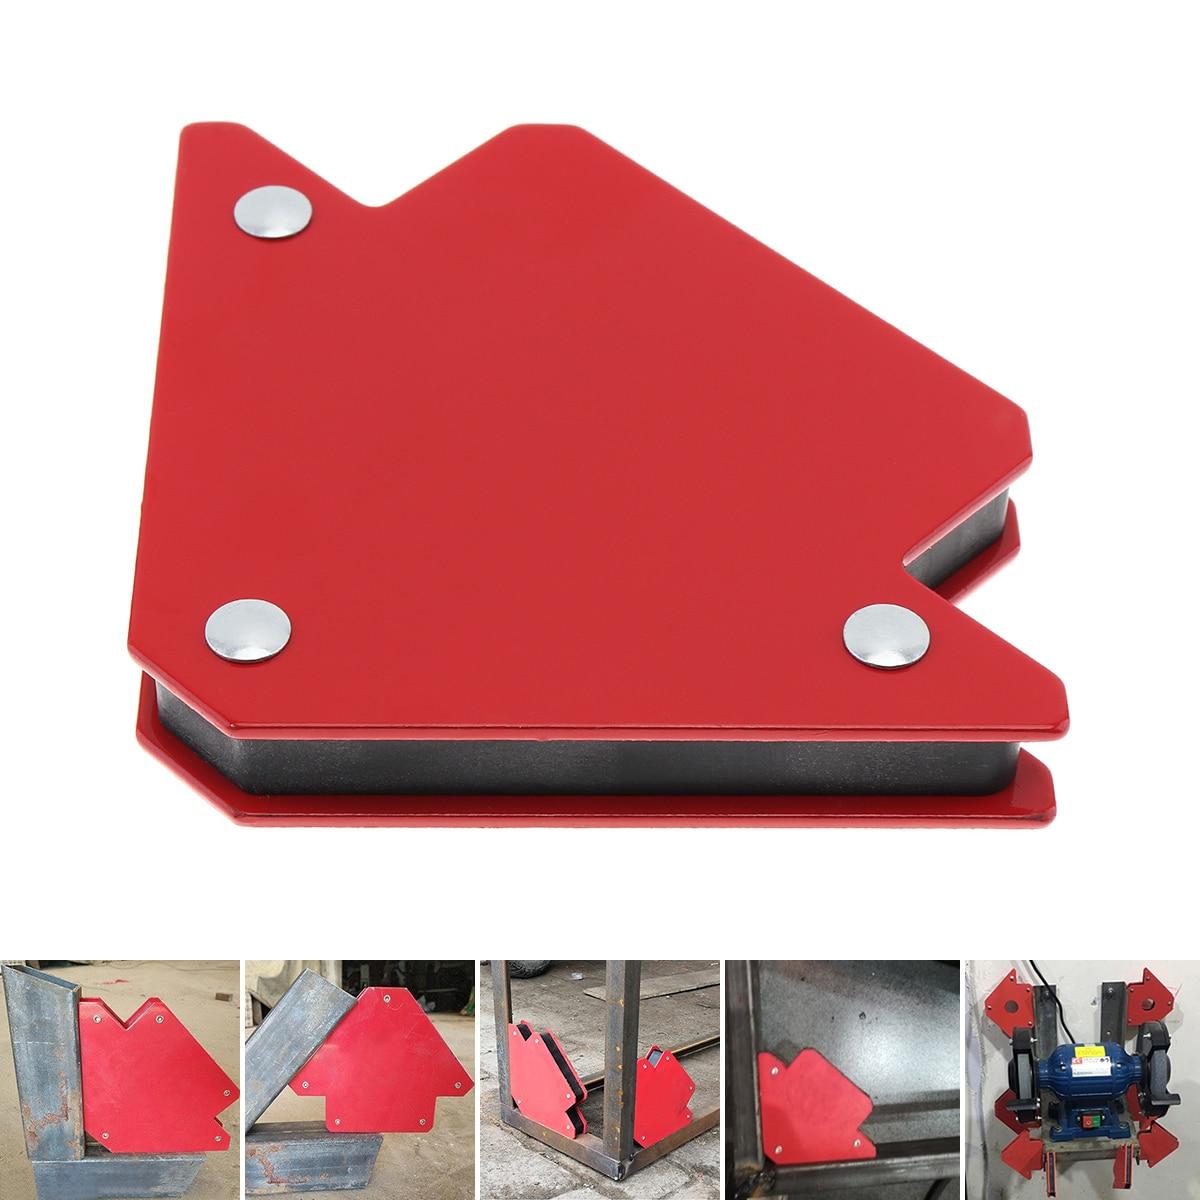 1PCS 25LBS Ferrite Magnet Welding Magnetic Holder Strong Magnet 3 Angle Arrow Positioner Power Soldering Locator Tool